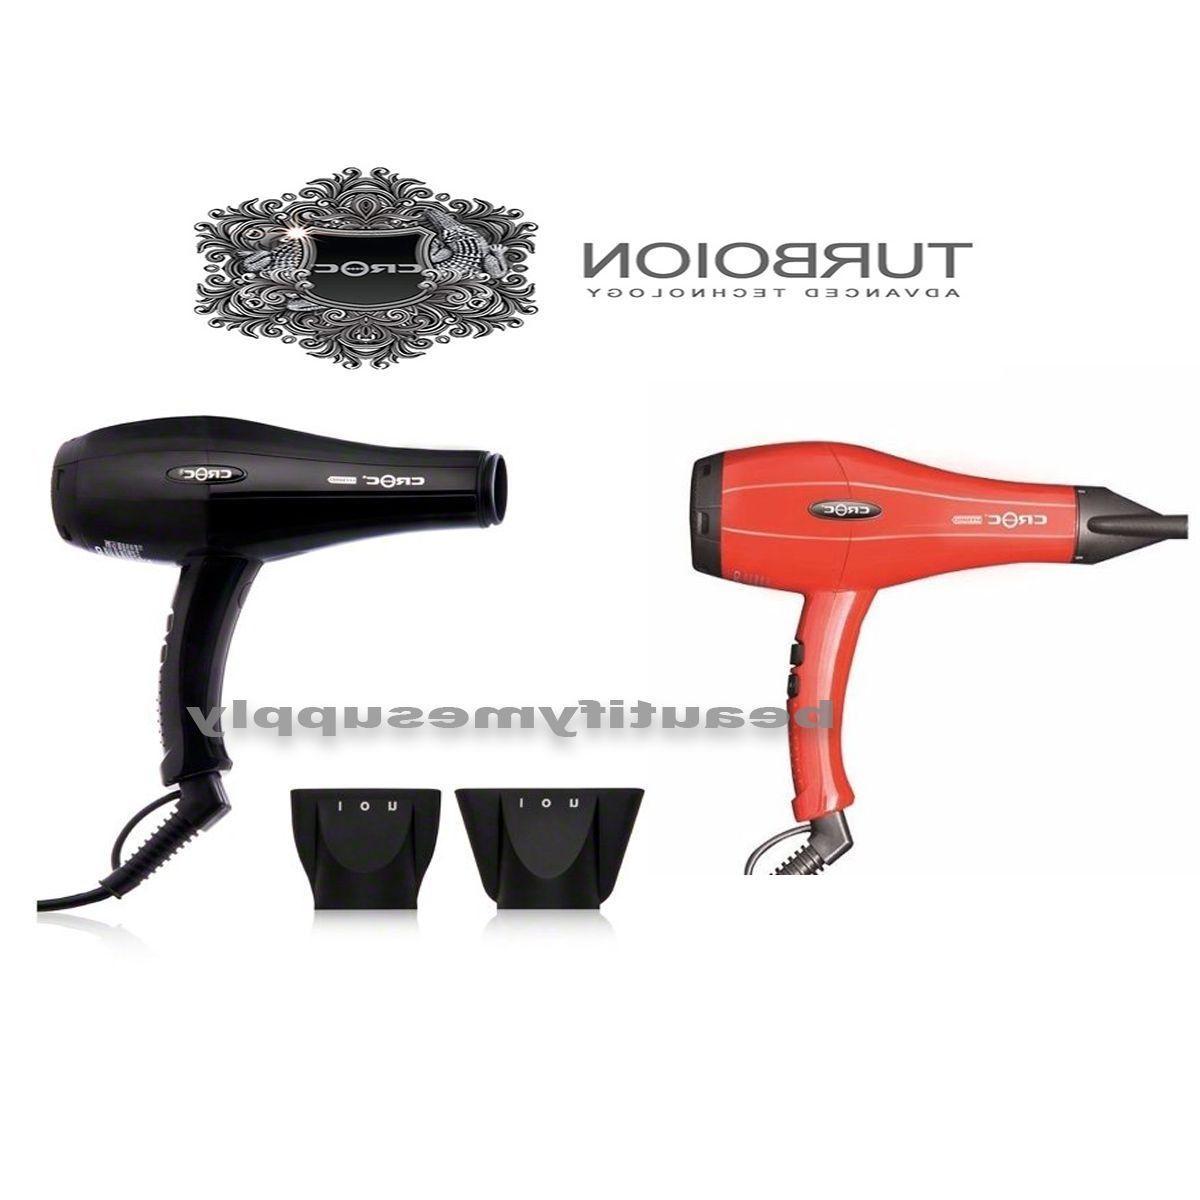 turboion hybrid professional lightweight ionic ceramic hair